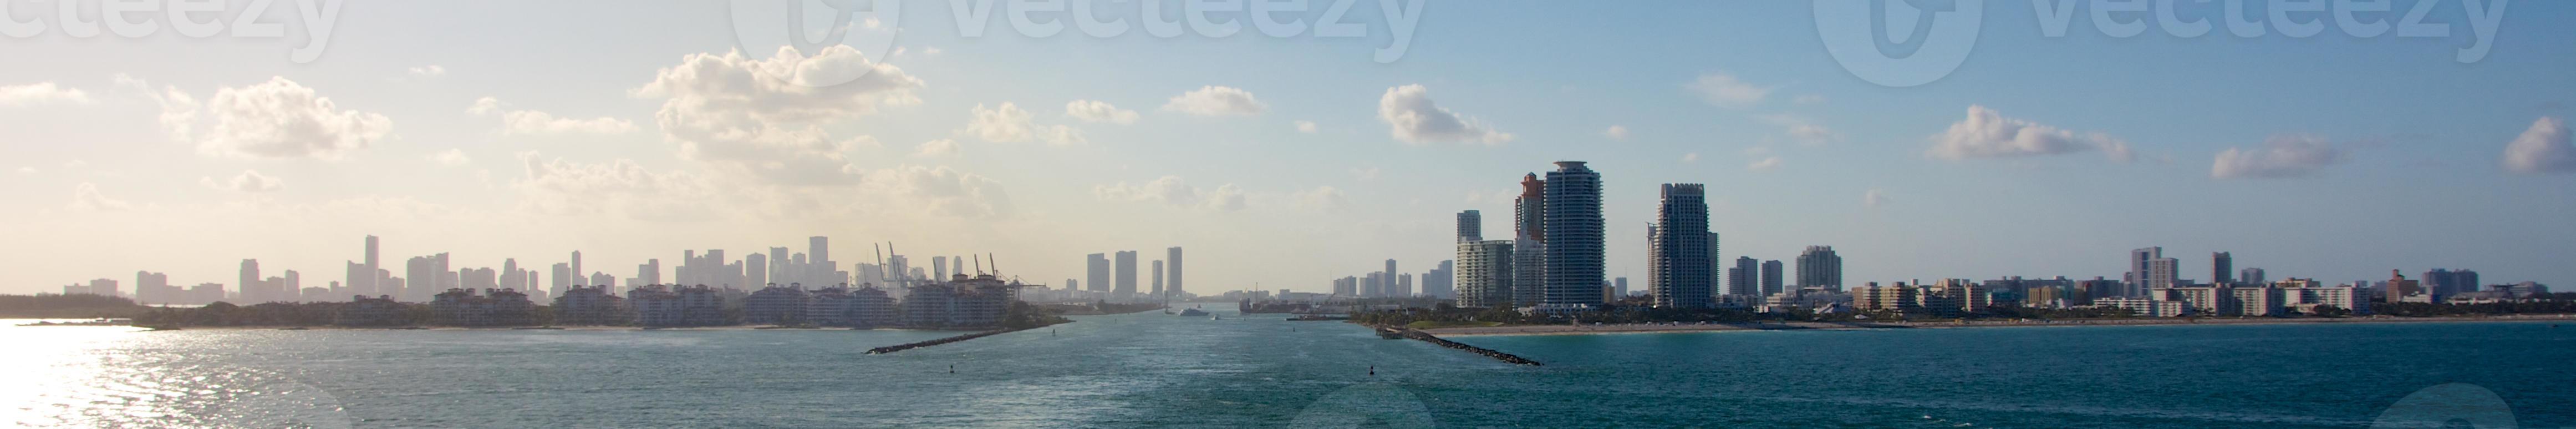 Miami Hafen Panorama foto